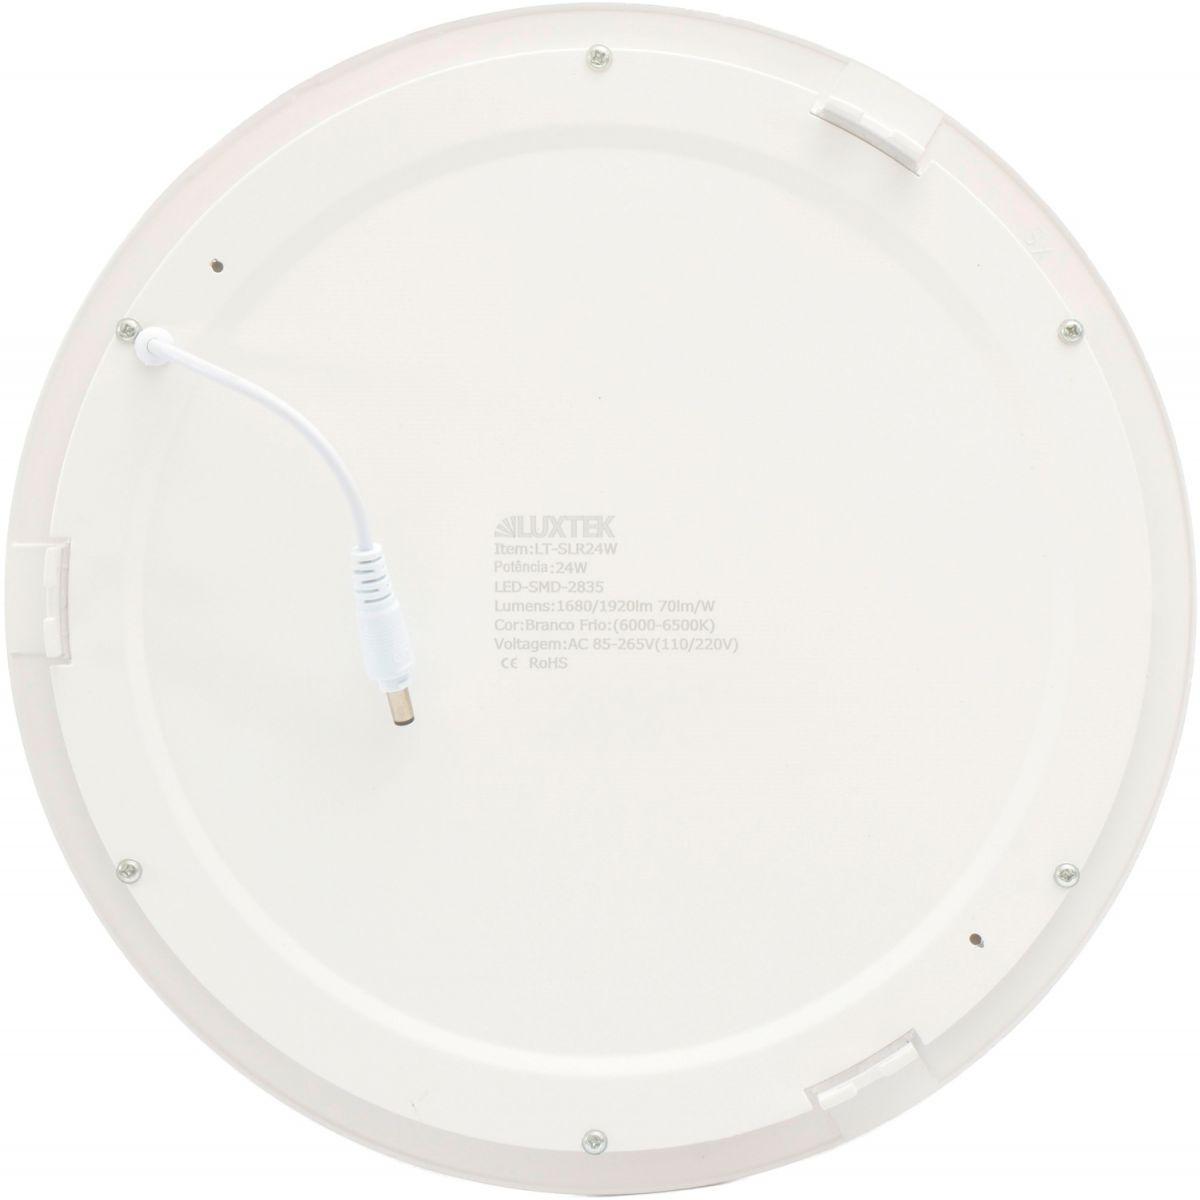 Luminária Plafon LED 24w Embutir Branco Frio Redonda - LUXTEK